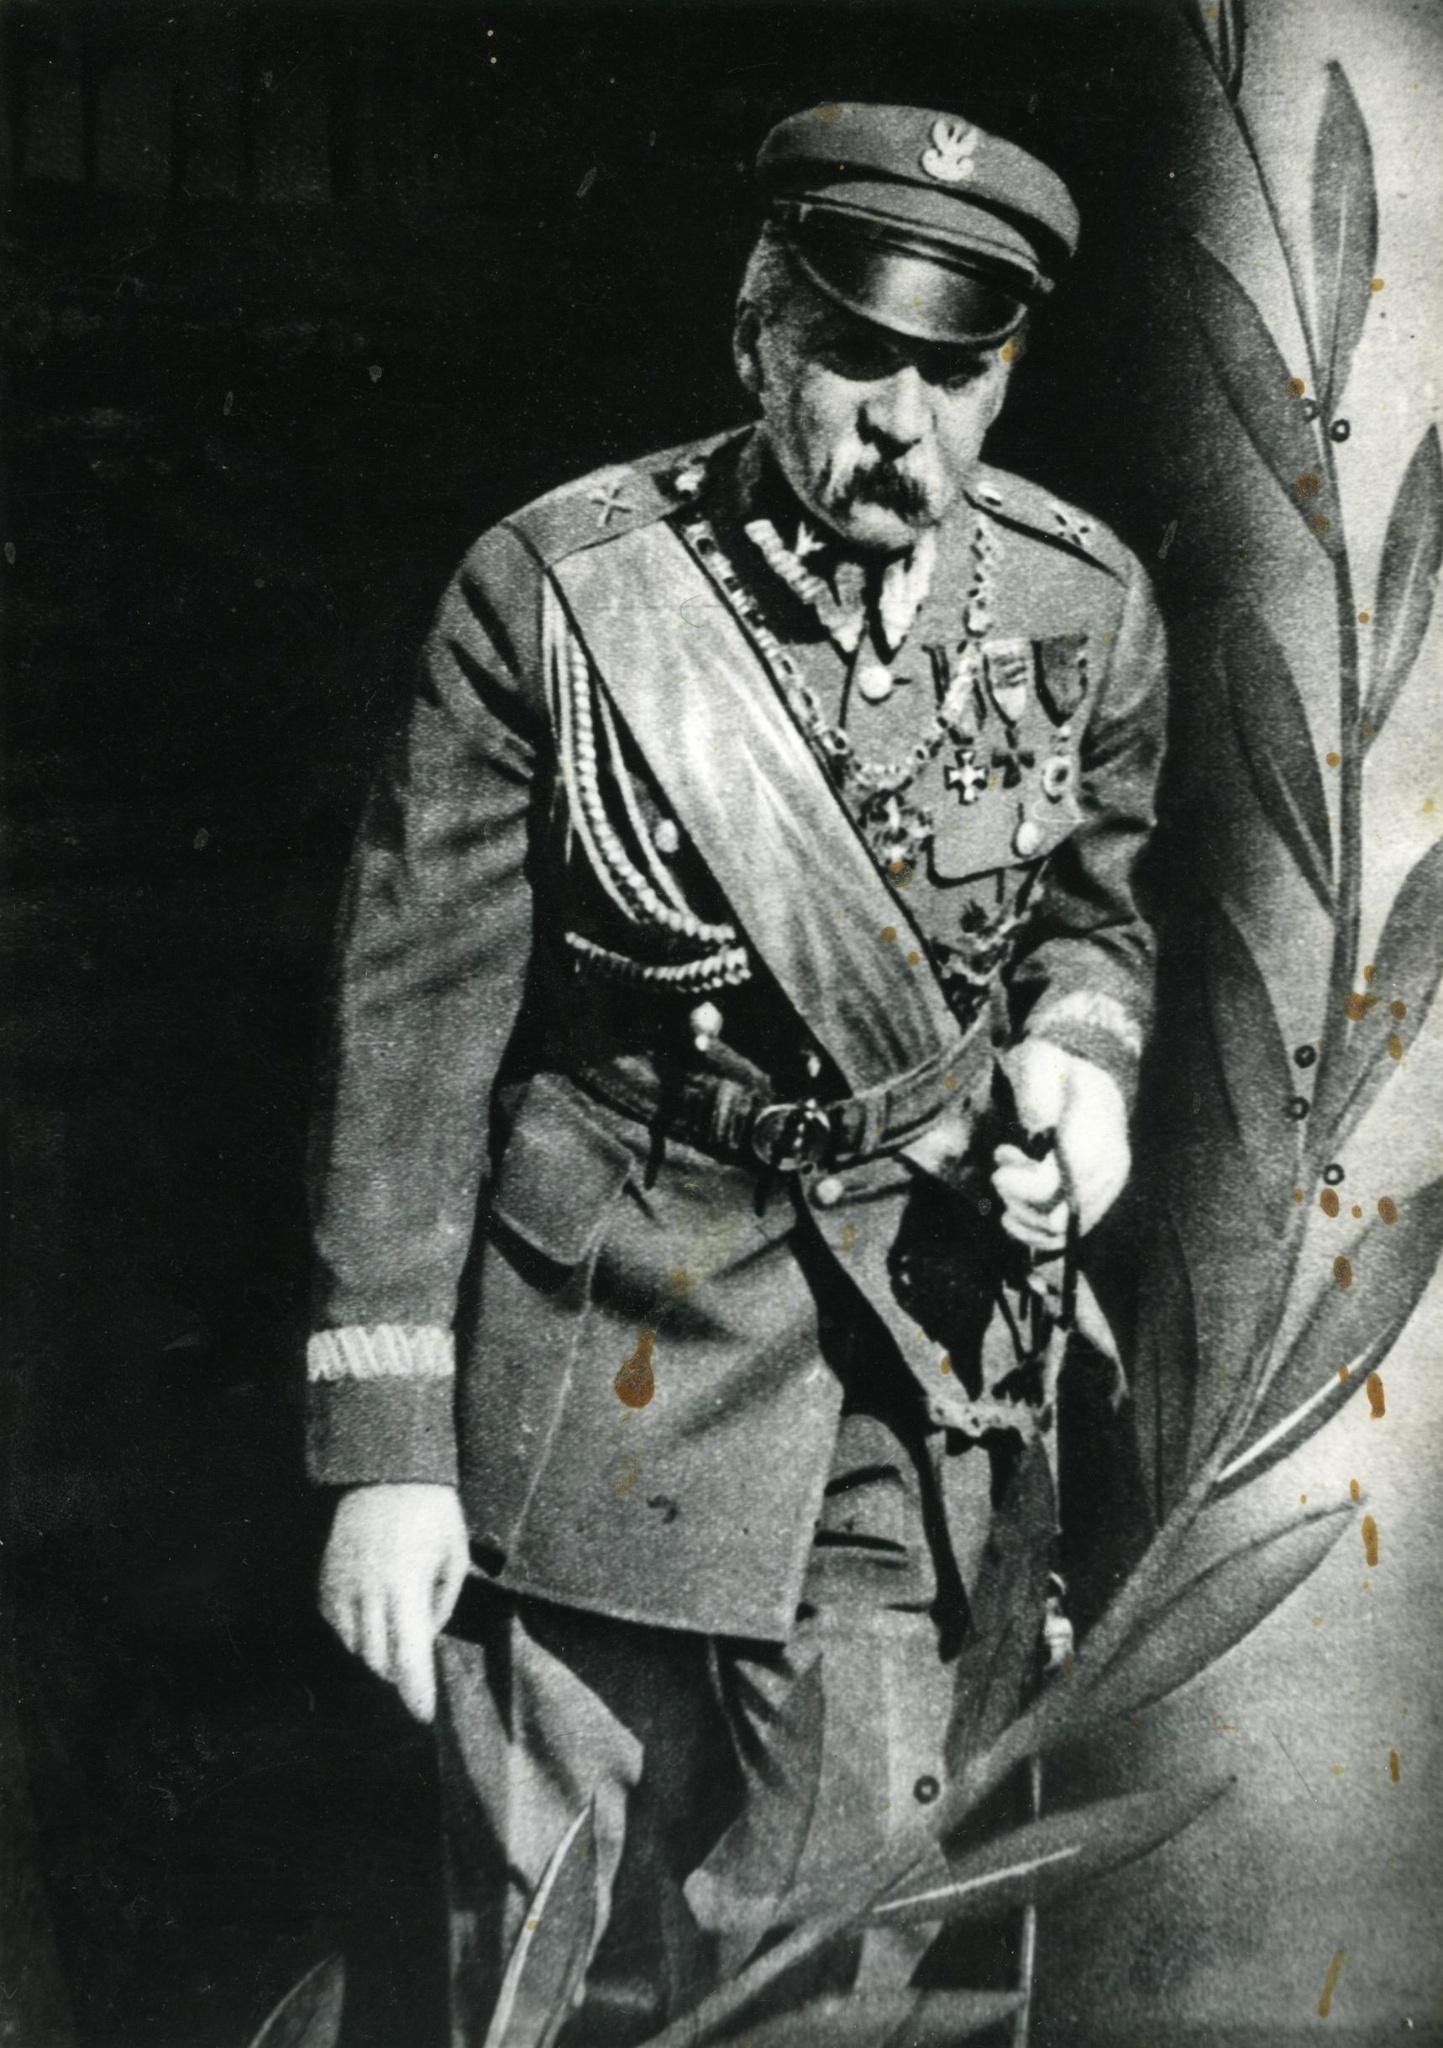 <div class='inner-box'><div class='close-desc'></div><span class='opis'>J&oacute;zef Piłsudski. Rumunia, 1928</span><div class='clearfix'></div><span>Sygn. FIL03159</span><div class='clearfix'></div><span>&copy; Instytut Literacki</span></div>